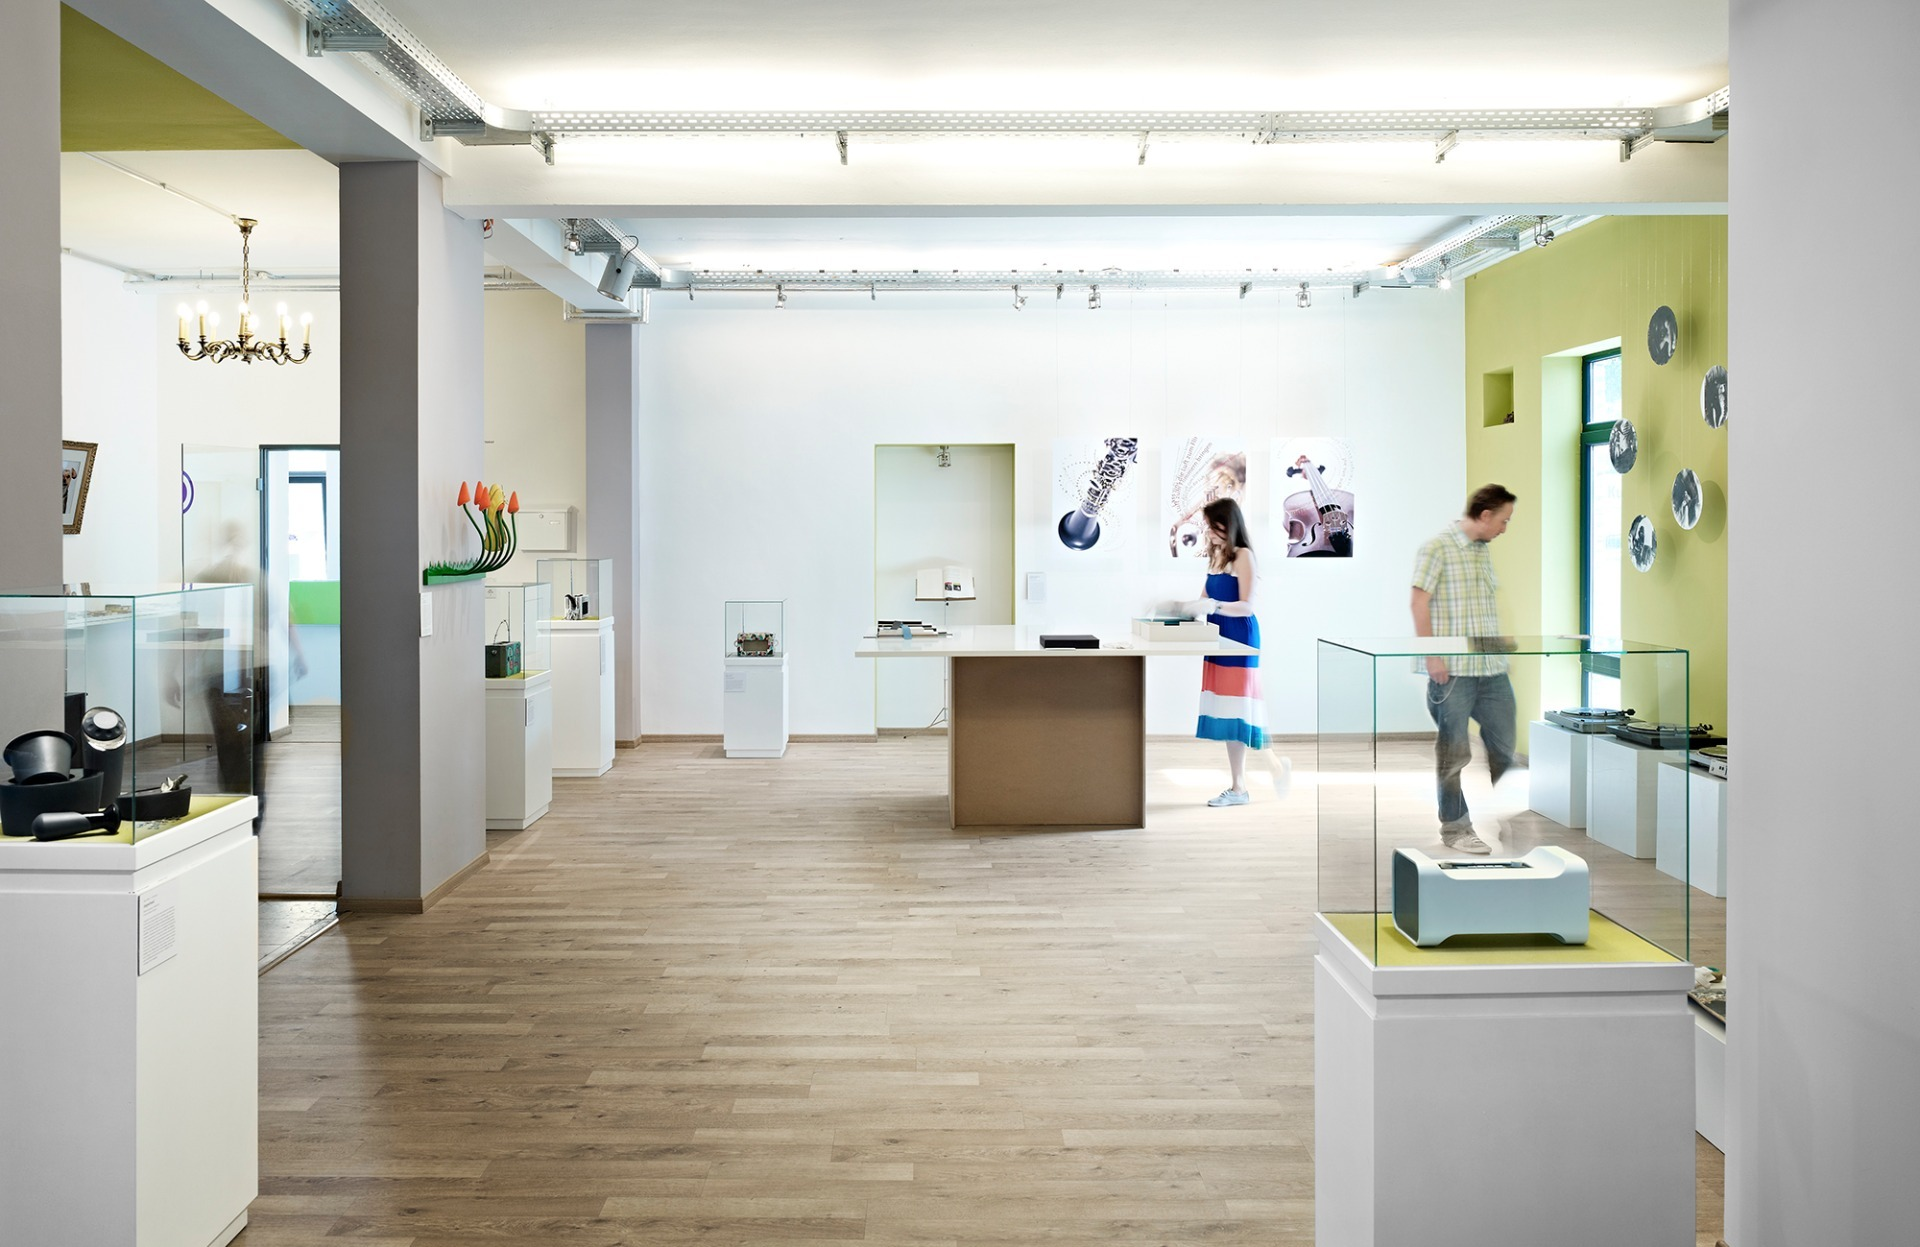 Kommunikationsdesign Studium im Design Quartier Köln Ehrenfeld